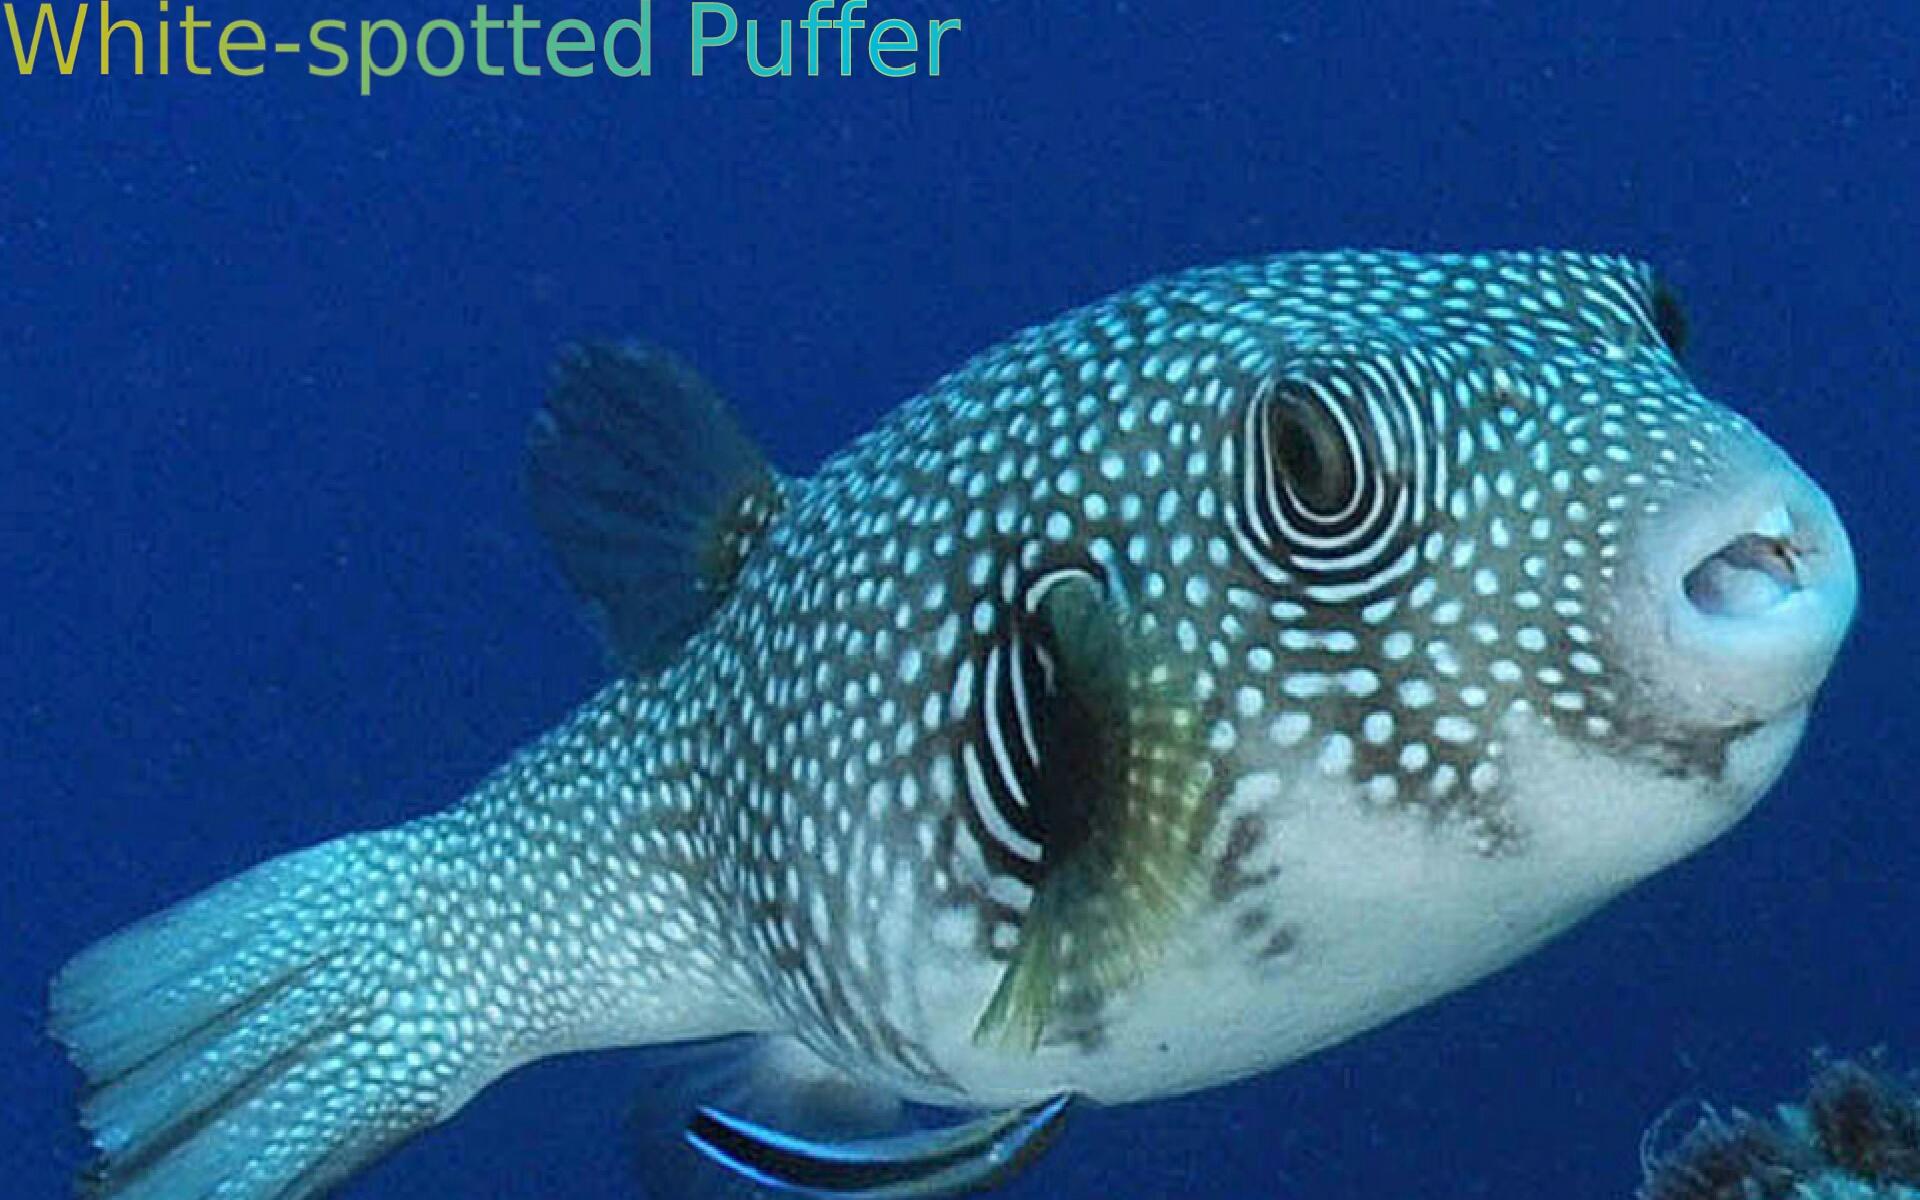 Marine aquarium fish appstore for android for Sjfc fish r net